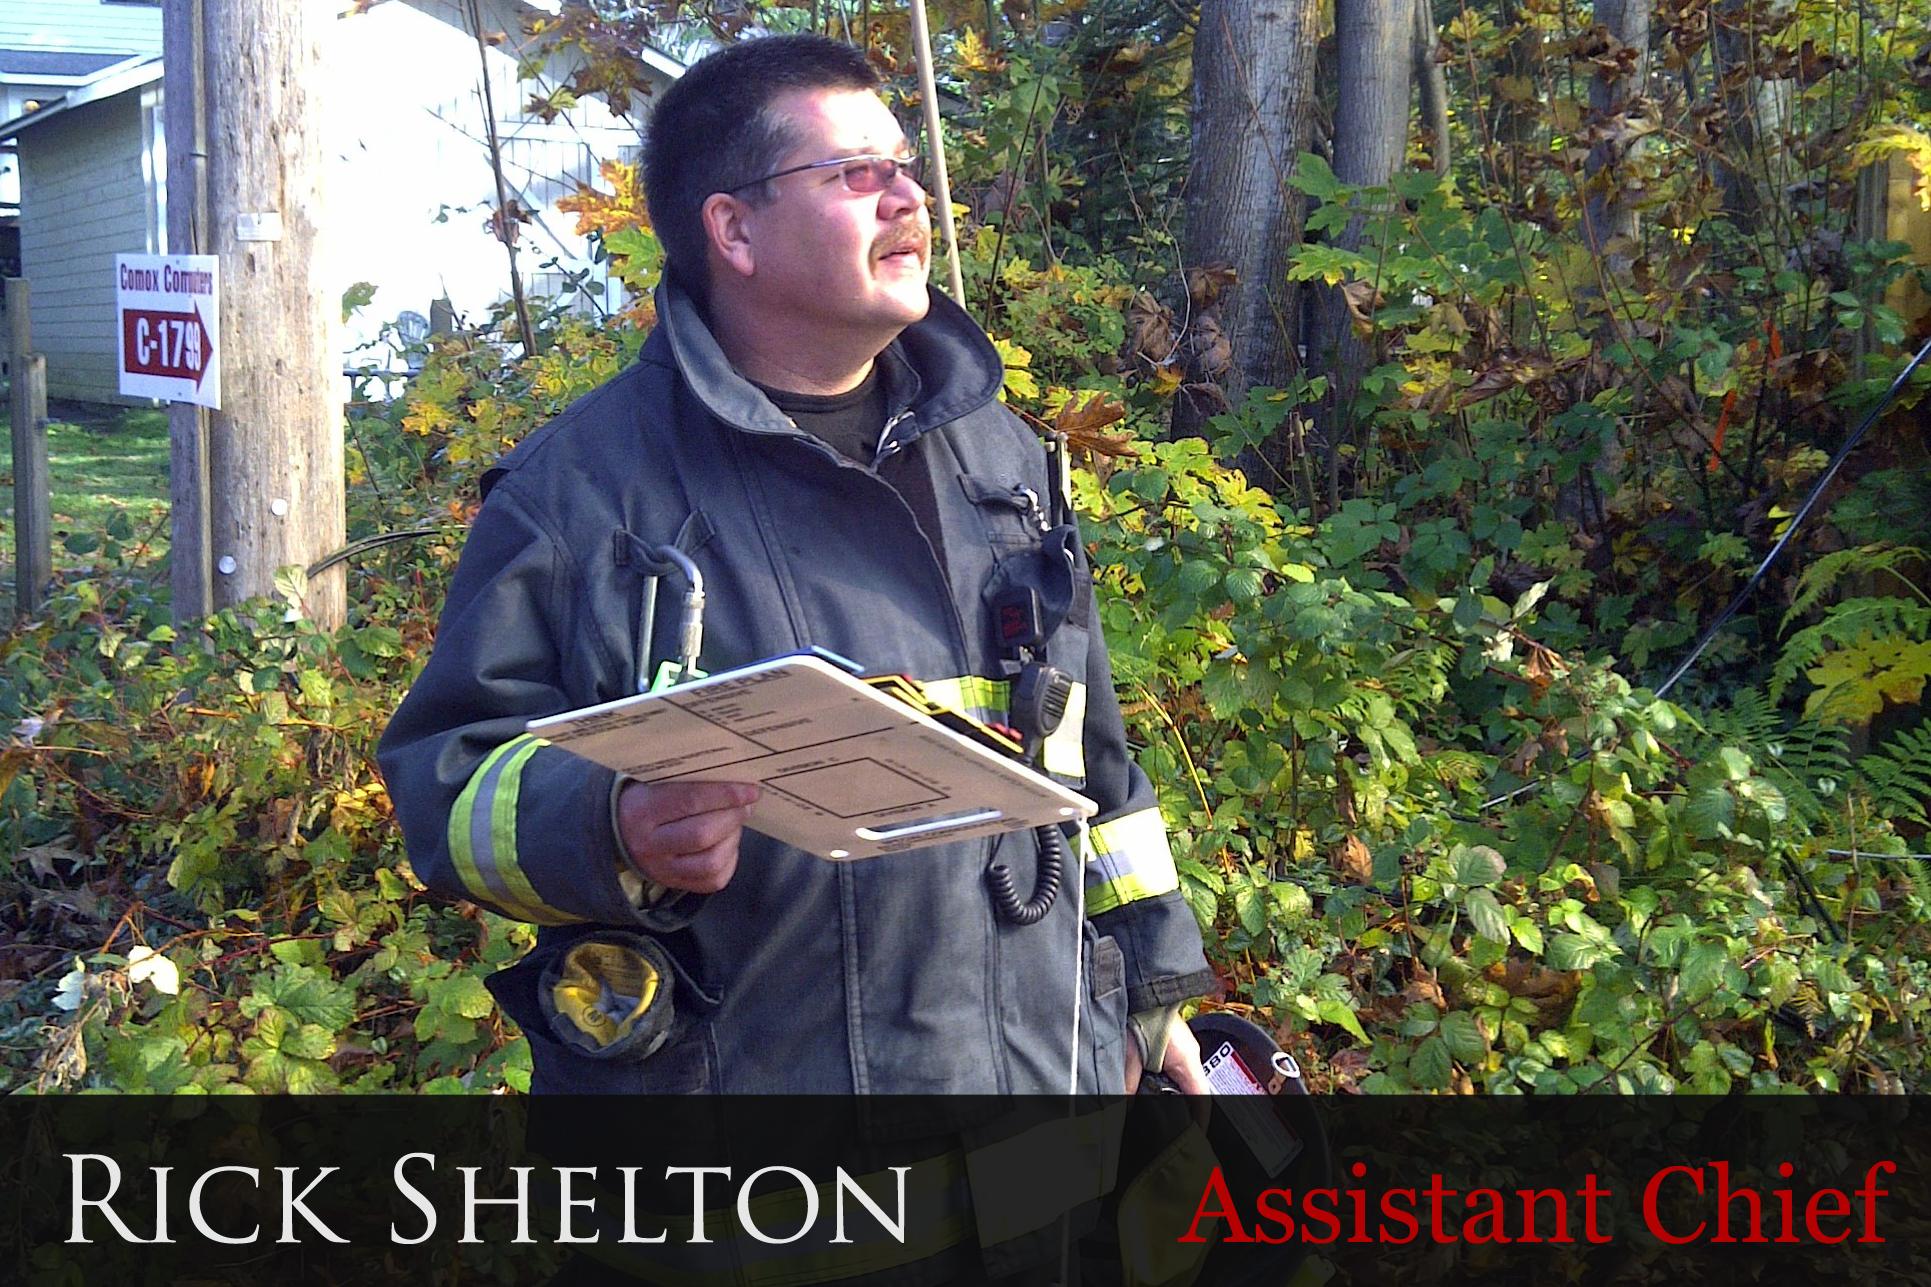 Comox Assistant Chief Rick Shelton